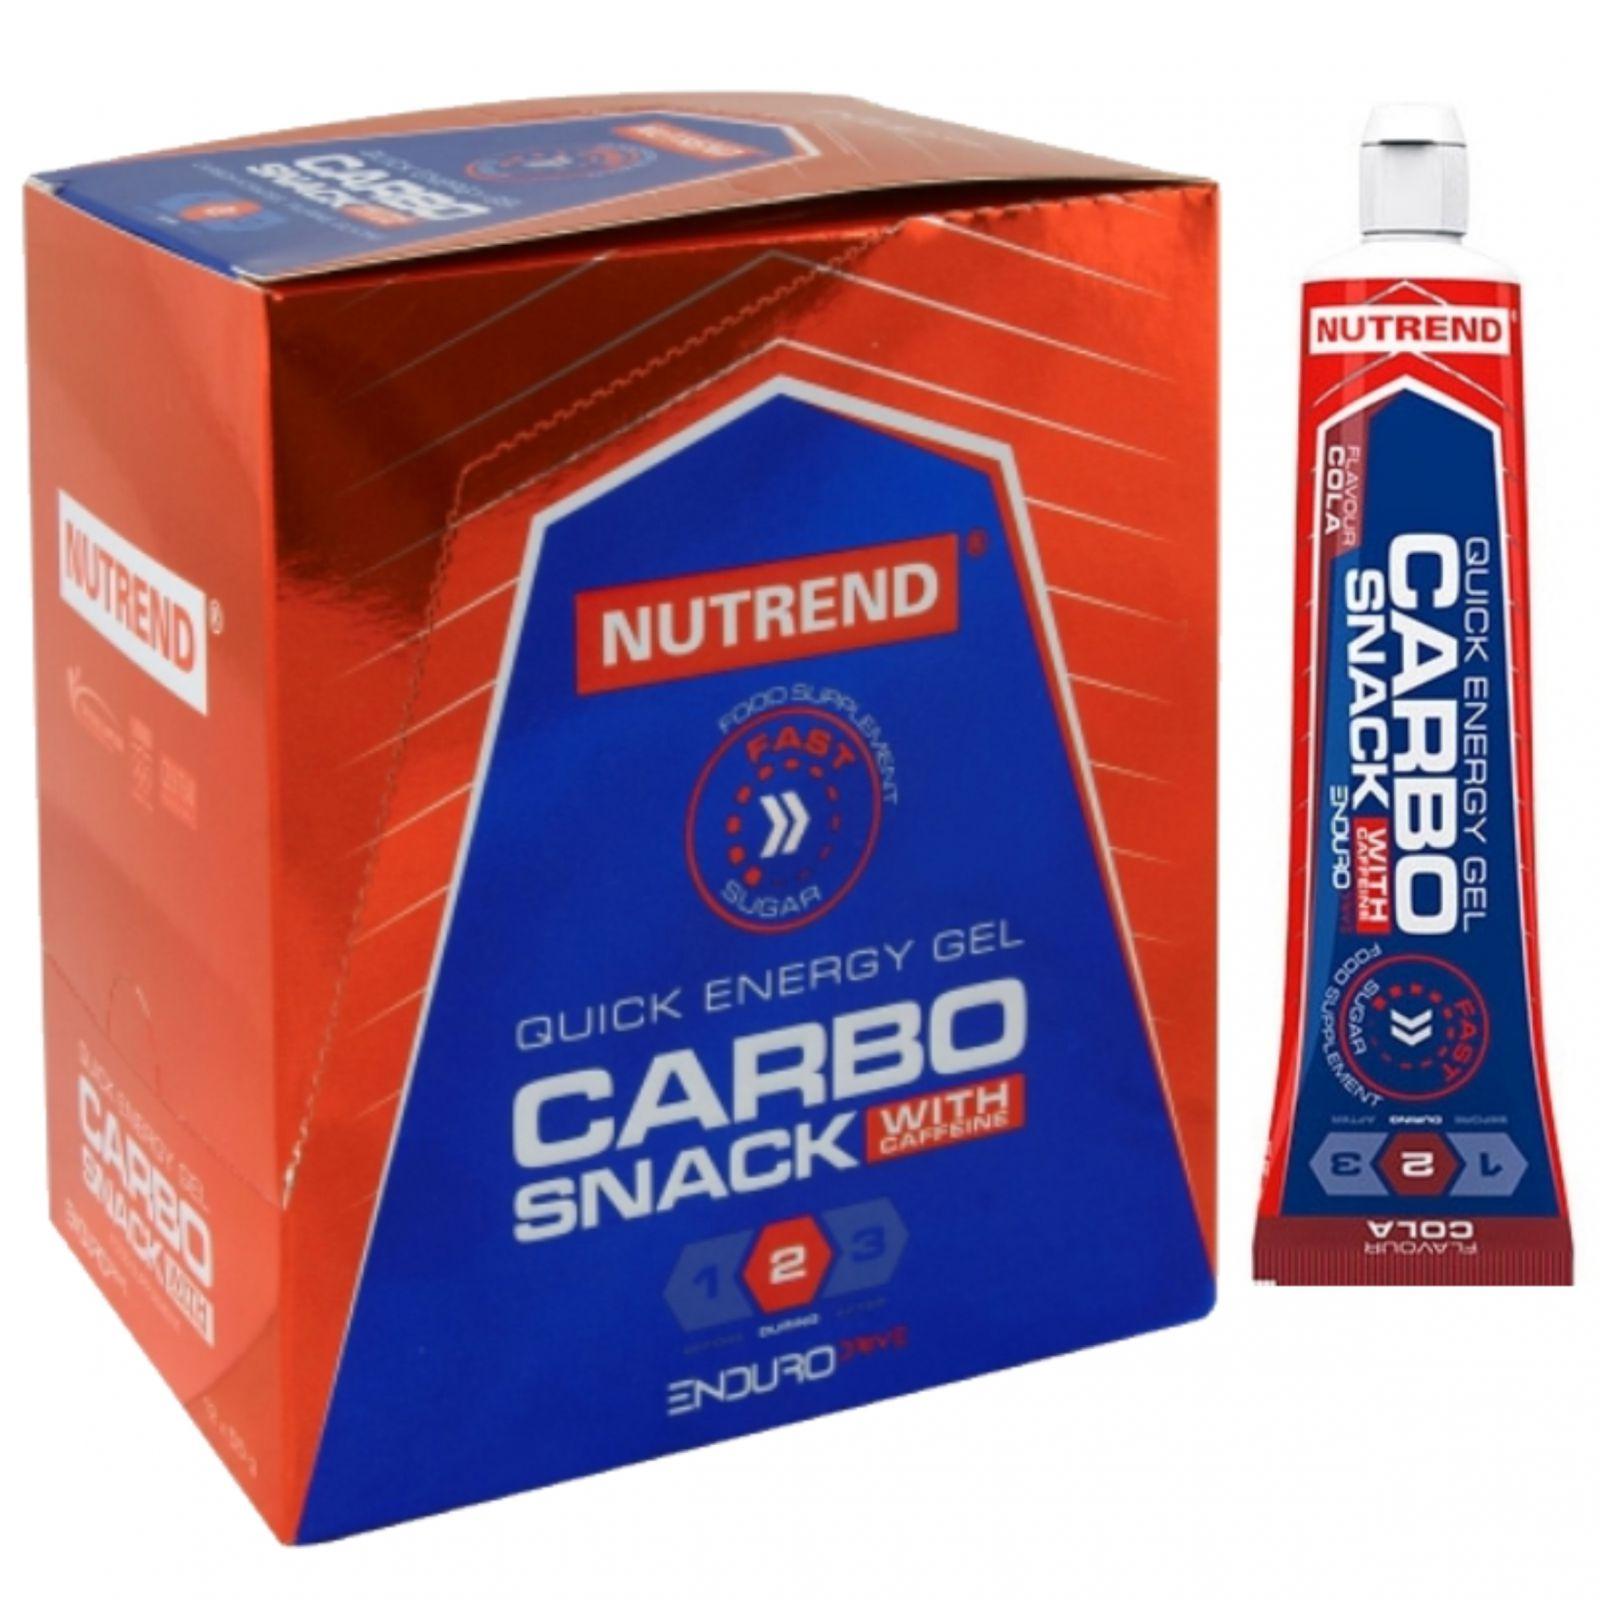 Nutrend Carbosnack with caffeine tuba 18 x 55 g - příchuť cola